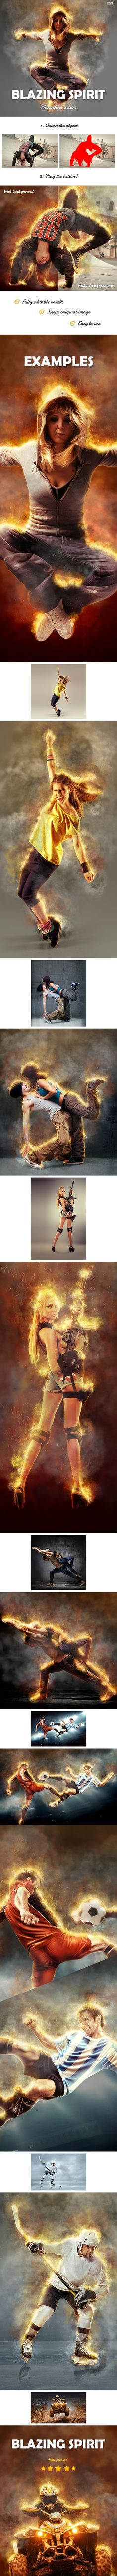 Blazing Spirit - Fire Photoshop Action #photoeffect Download: http://graphicriver.net/item/blazing-spirit-fire-photoshop-action/13448466?ref=ksioks